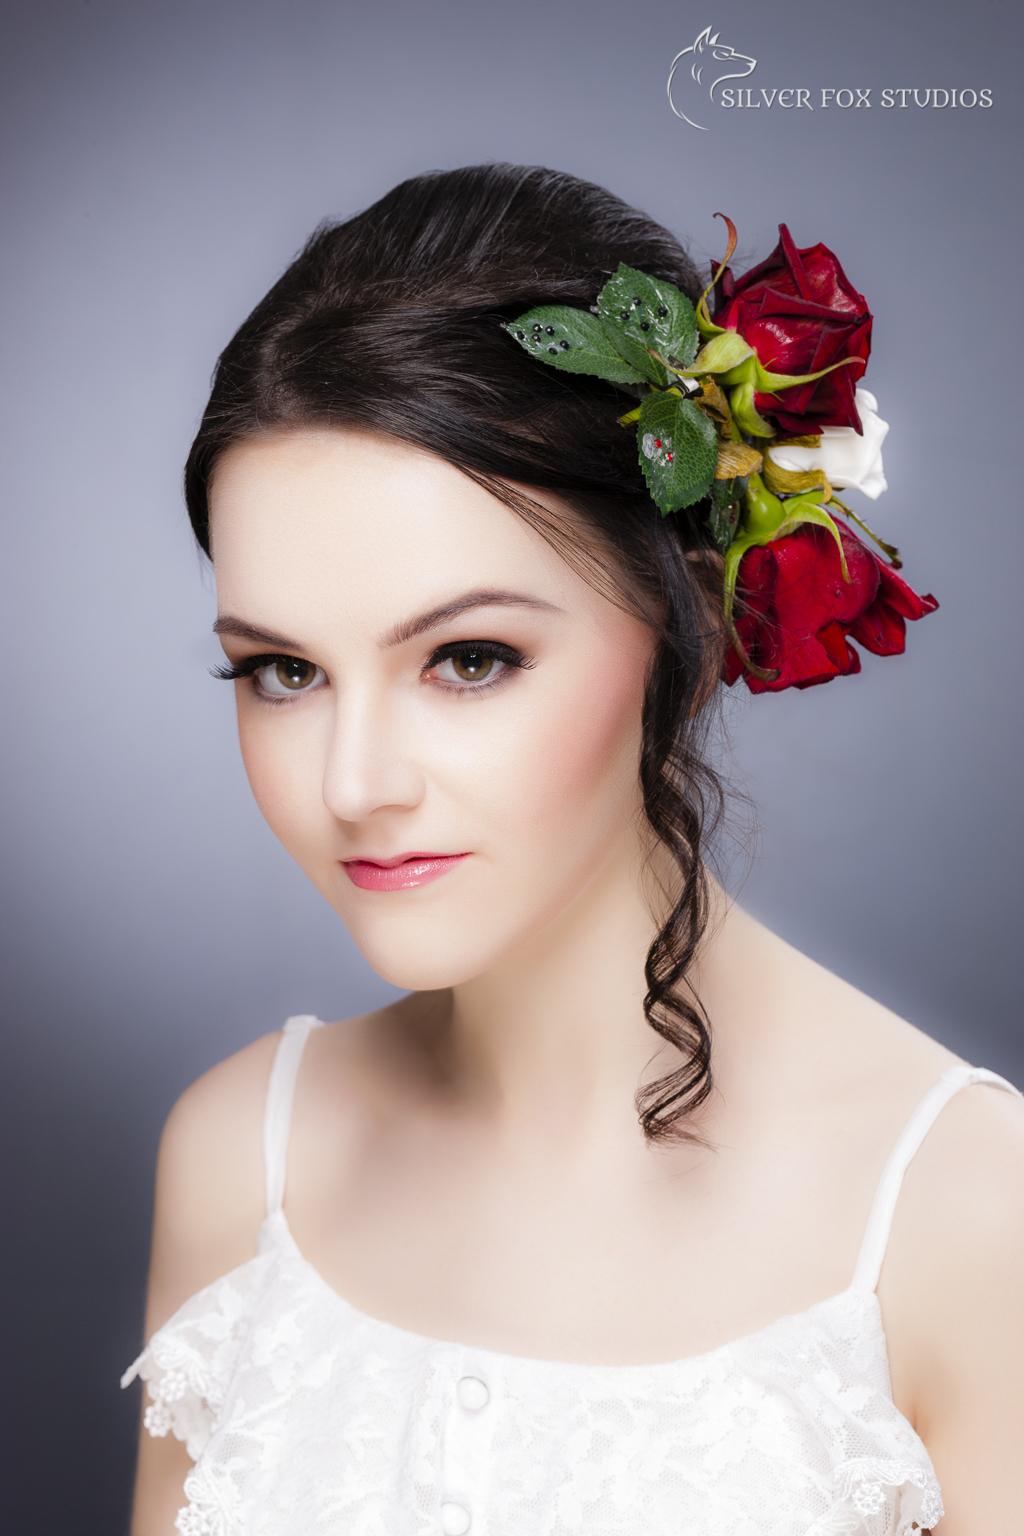 Beauty & Makeup Photography | Silver Fox Studios